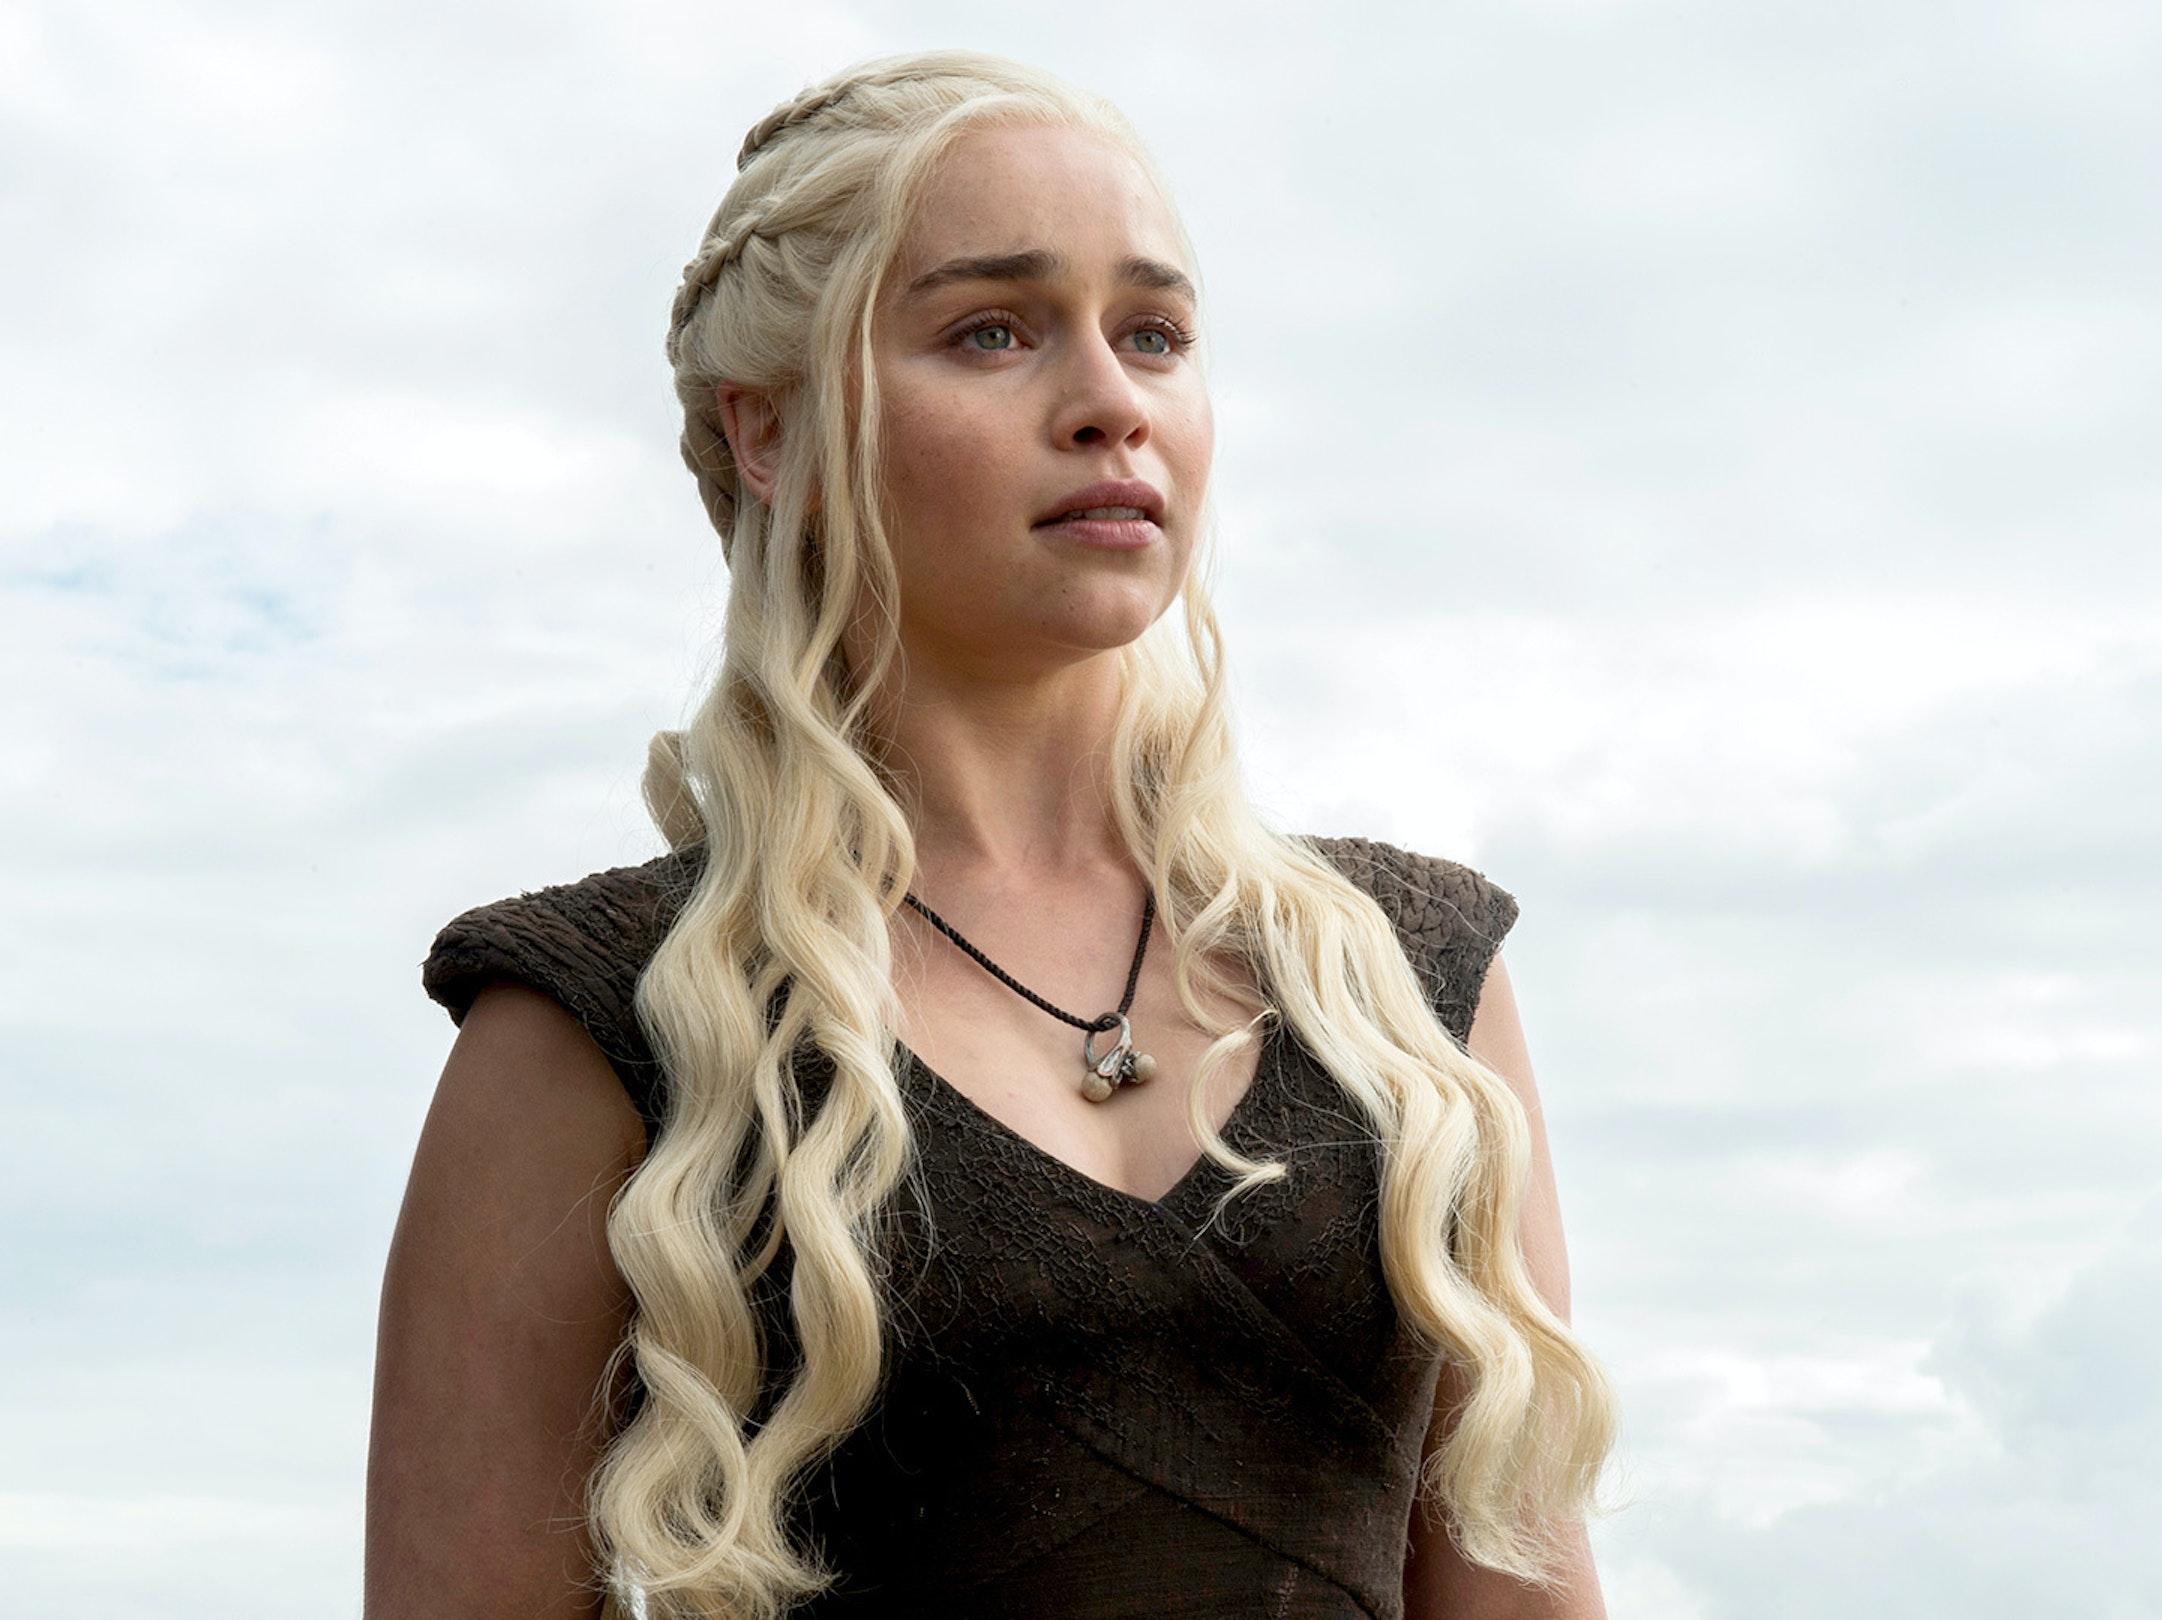 Khaleesi in 'Game of Thrones'